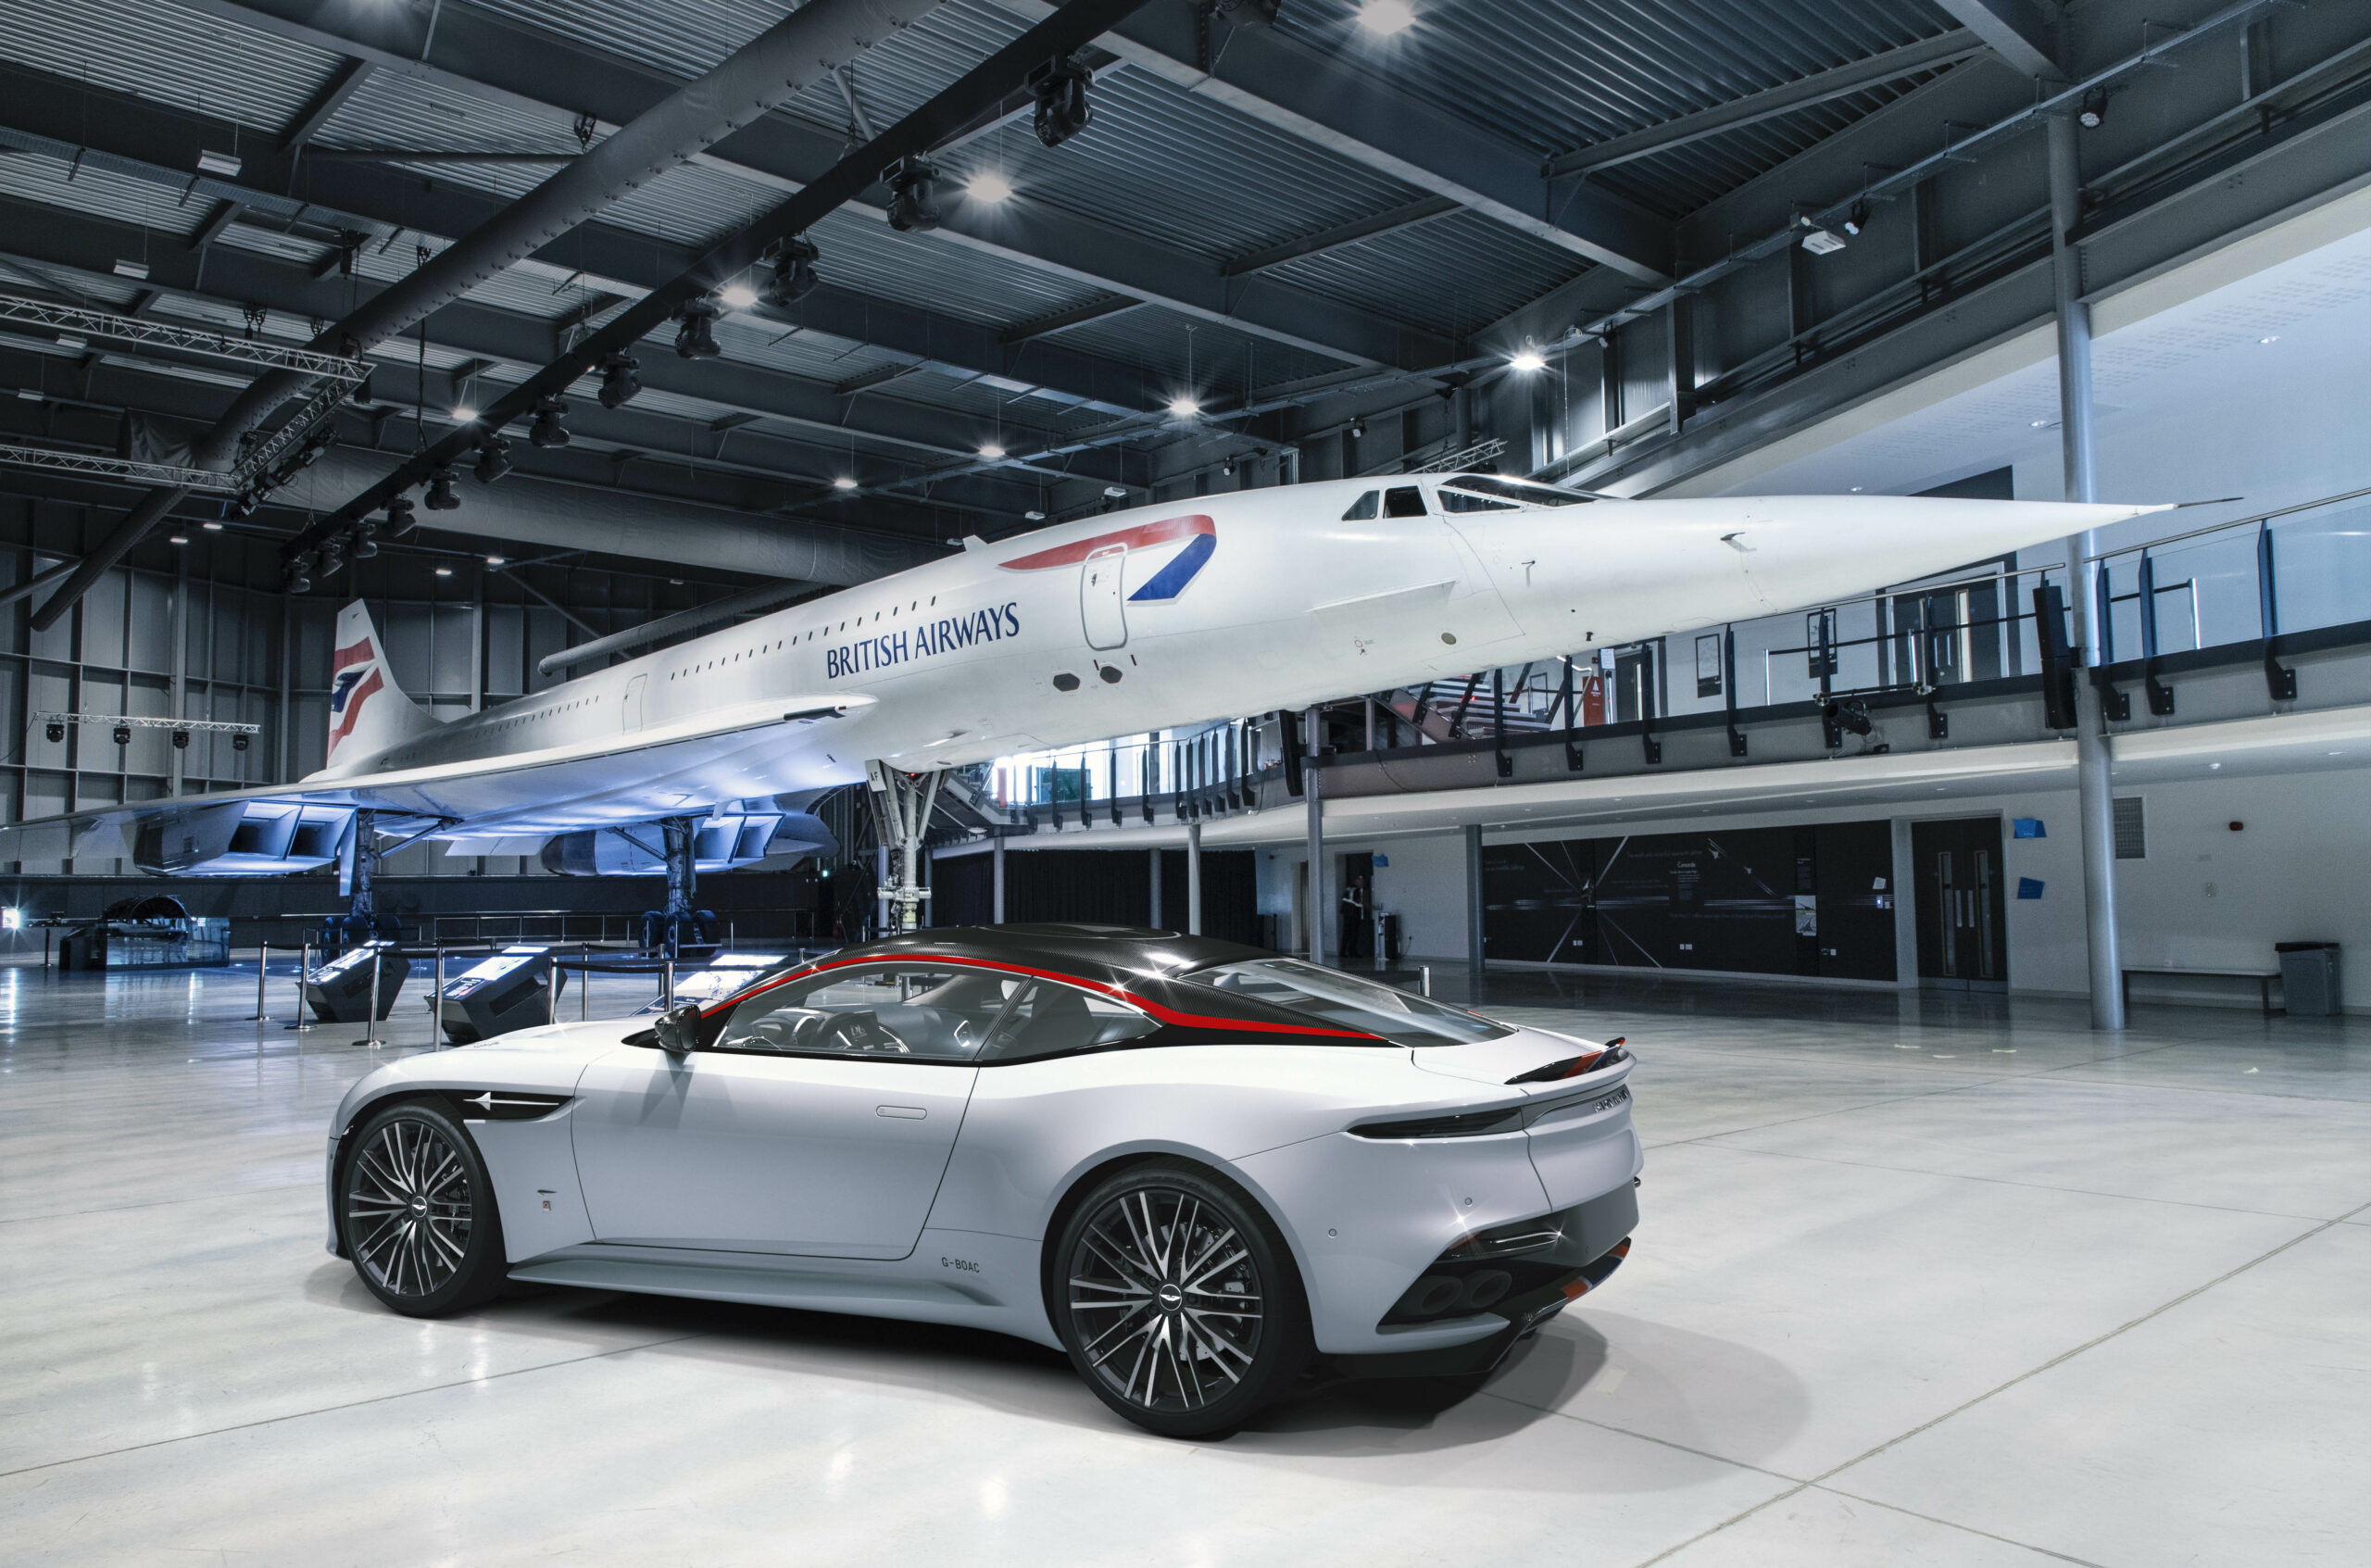 British Airways and Aston Martin DBS Superleggera Concorde Edition car